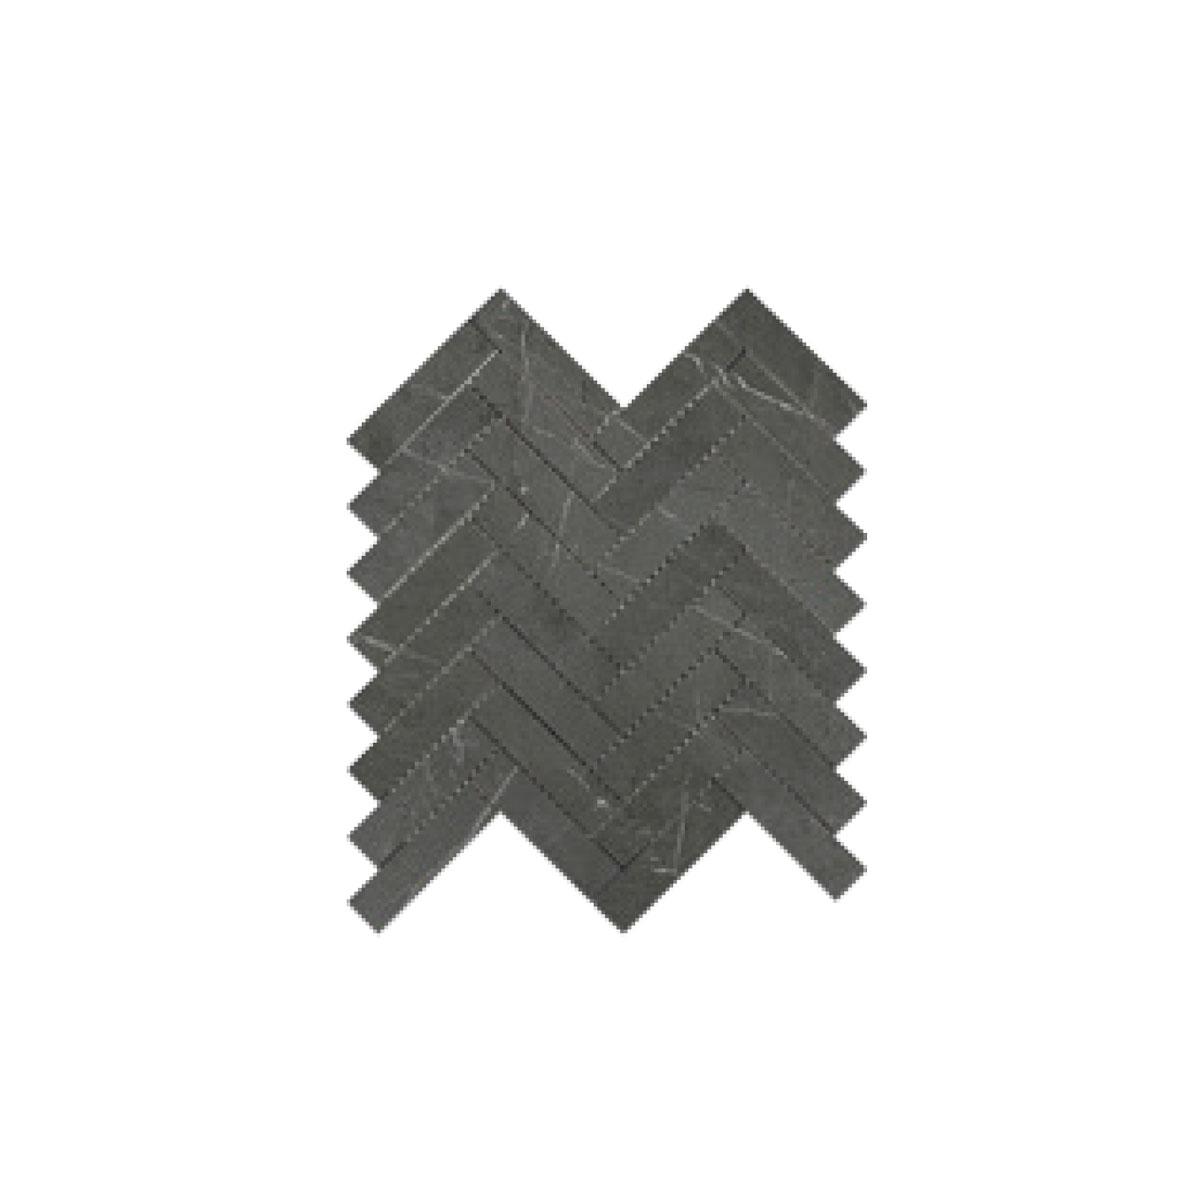 Bracca - Dark Grey - Marble Look Tiles - Stone3 Brisbane